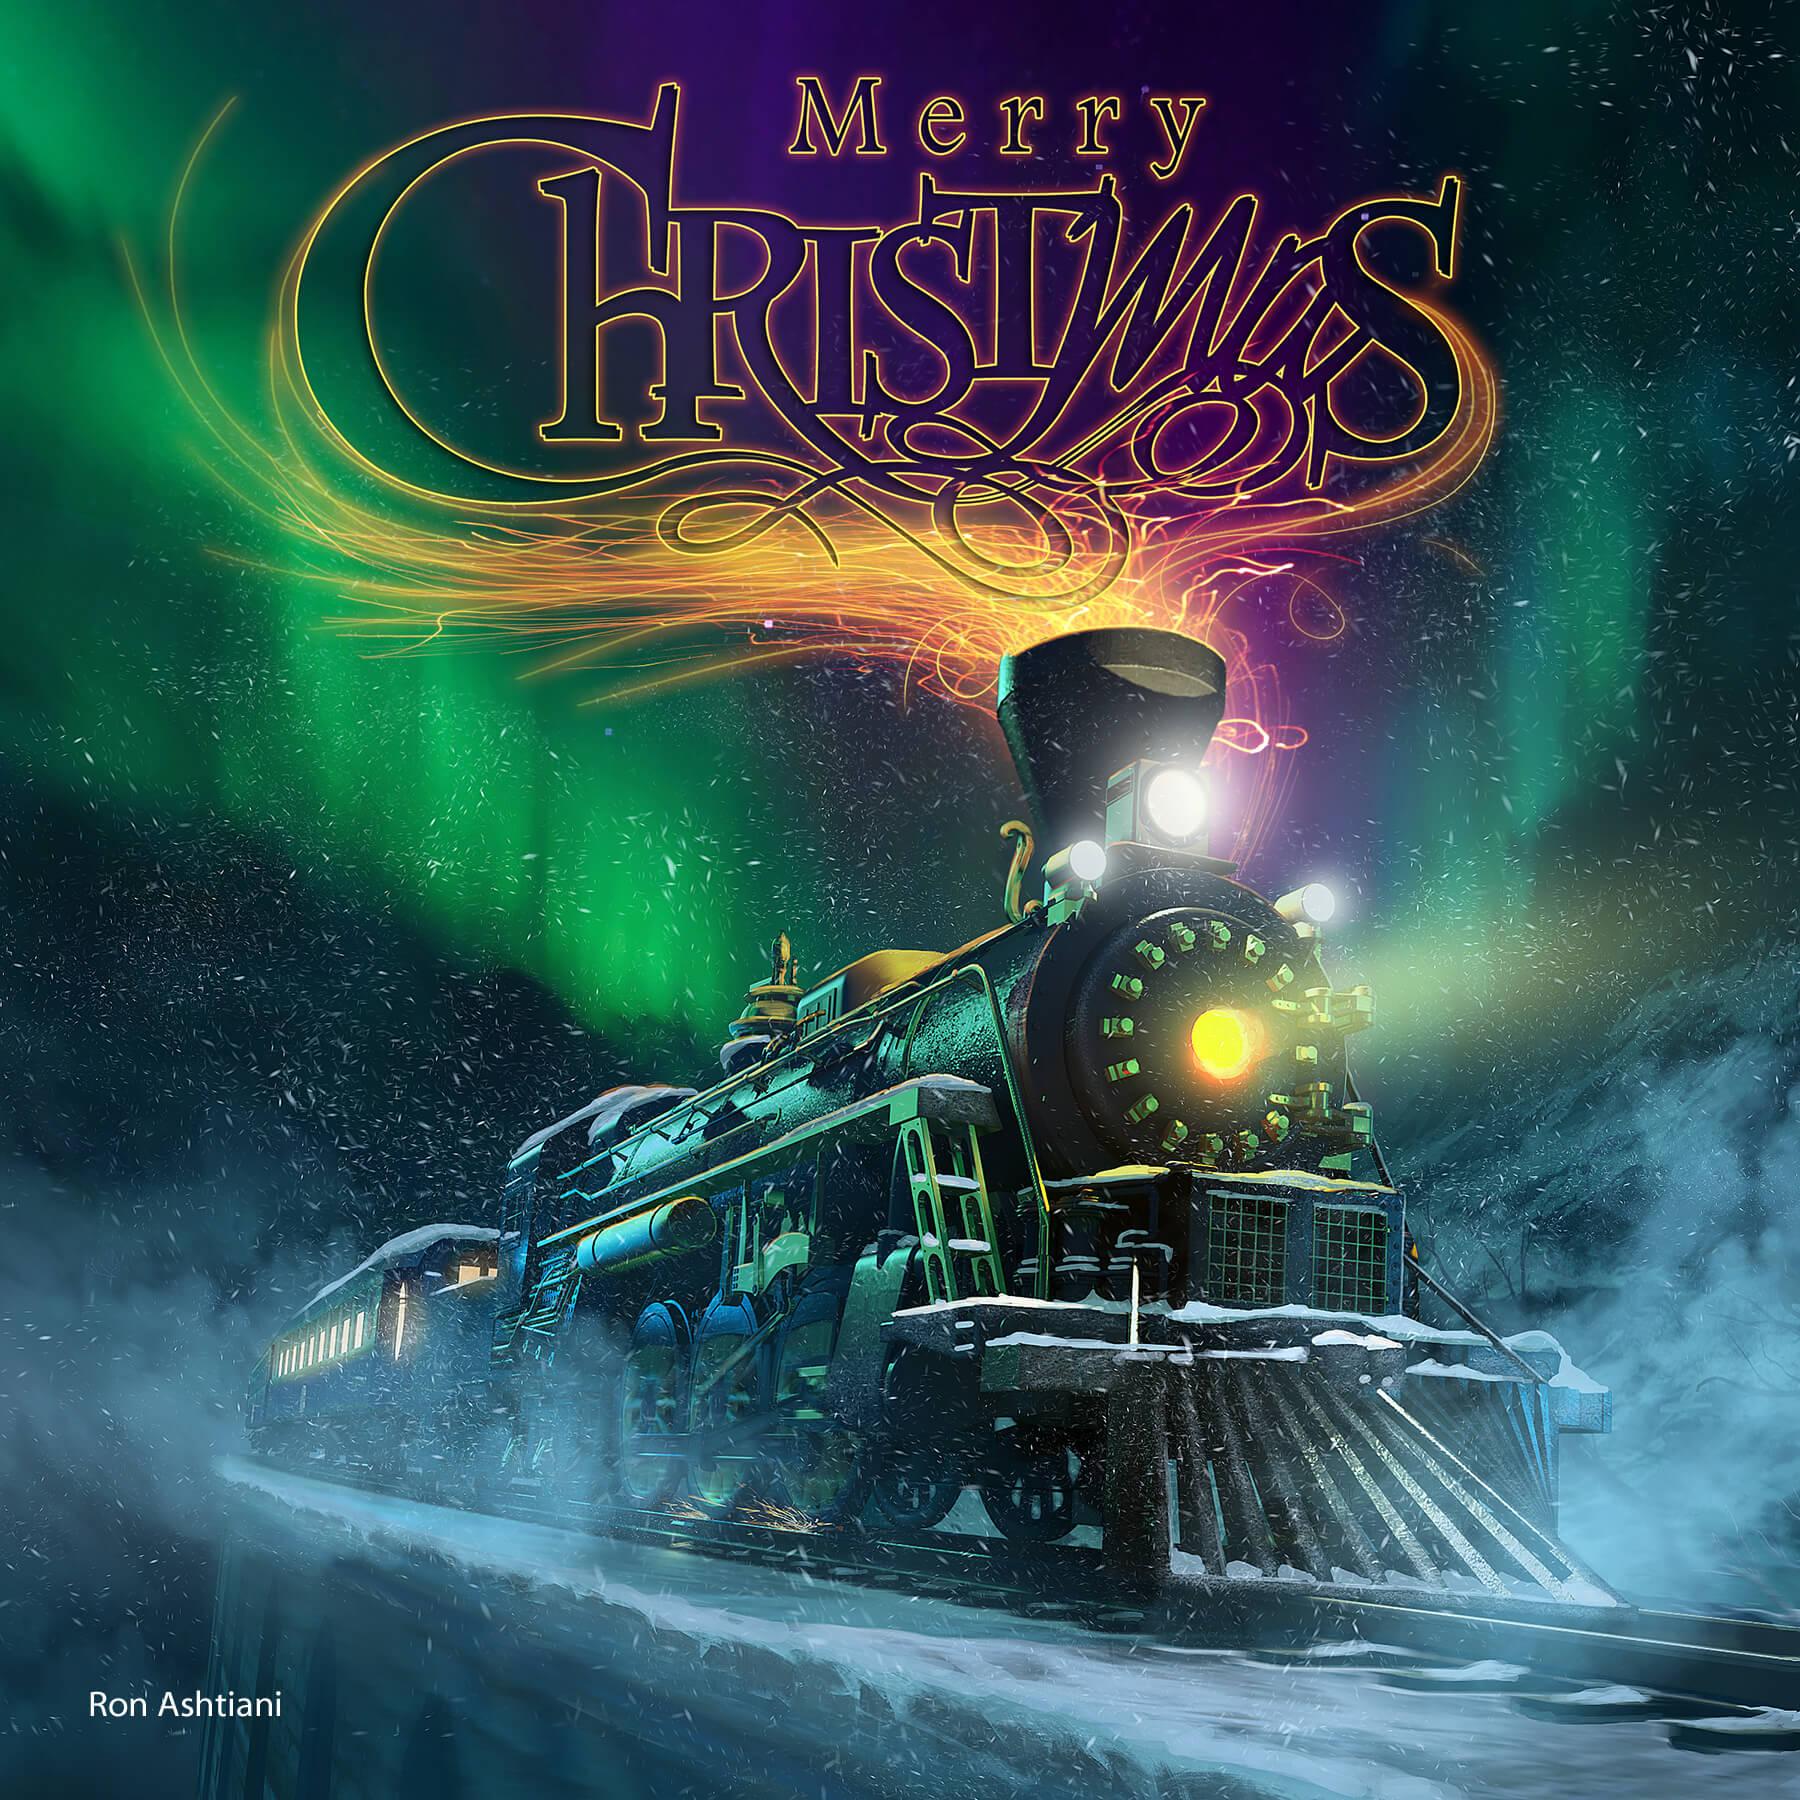 Atomhawk_News_Dec18_Announcements_Christmas Card_Polar Express_Ron Ashtiani.jpg